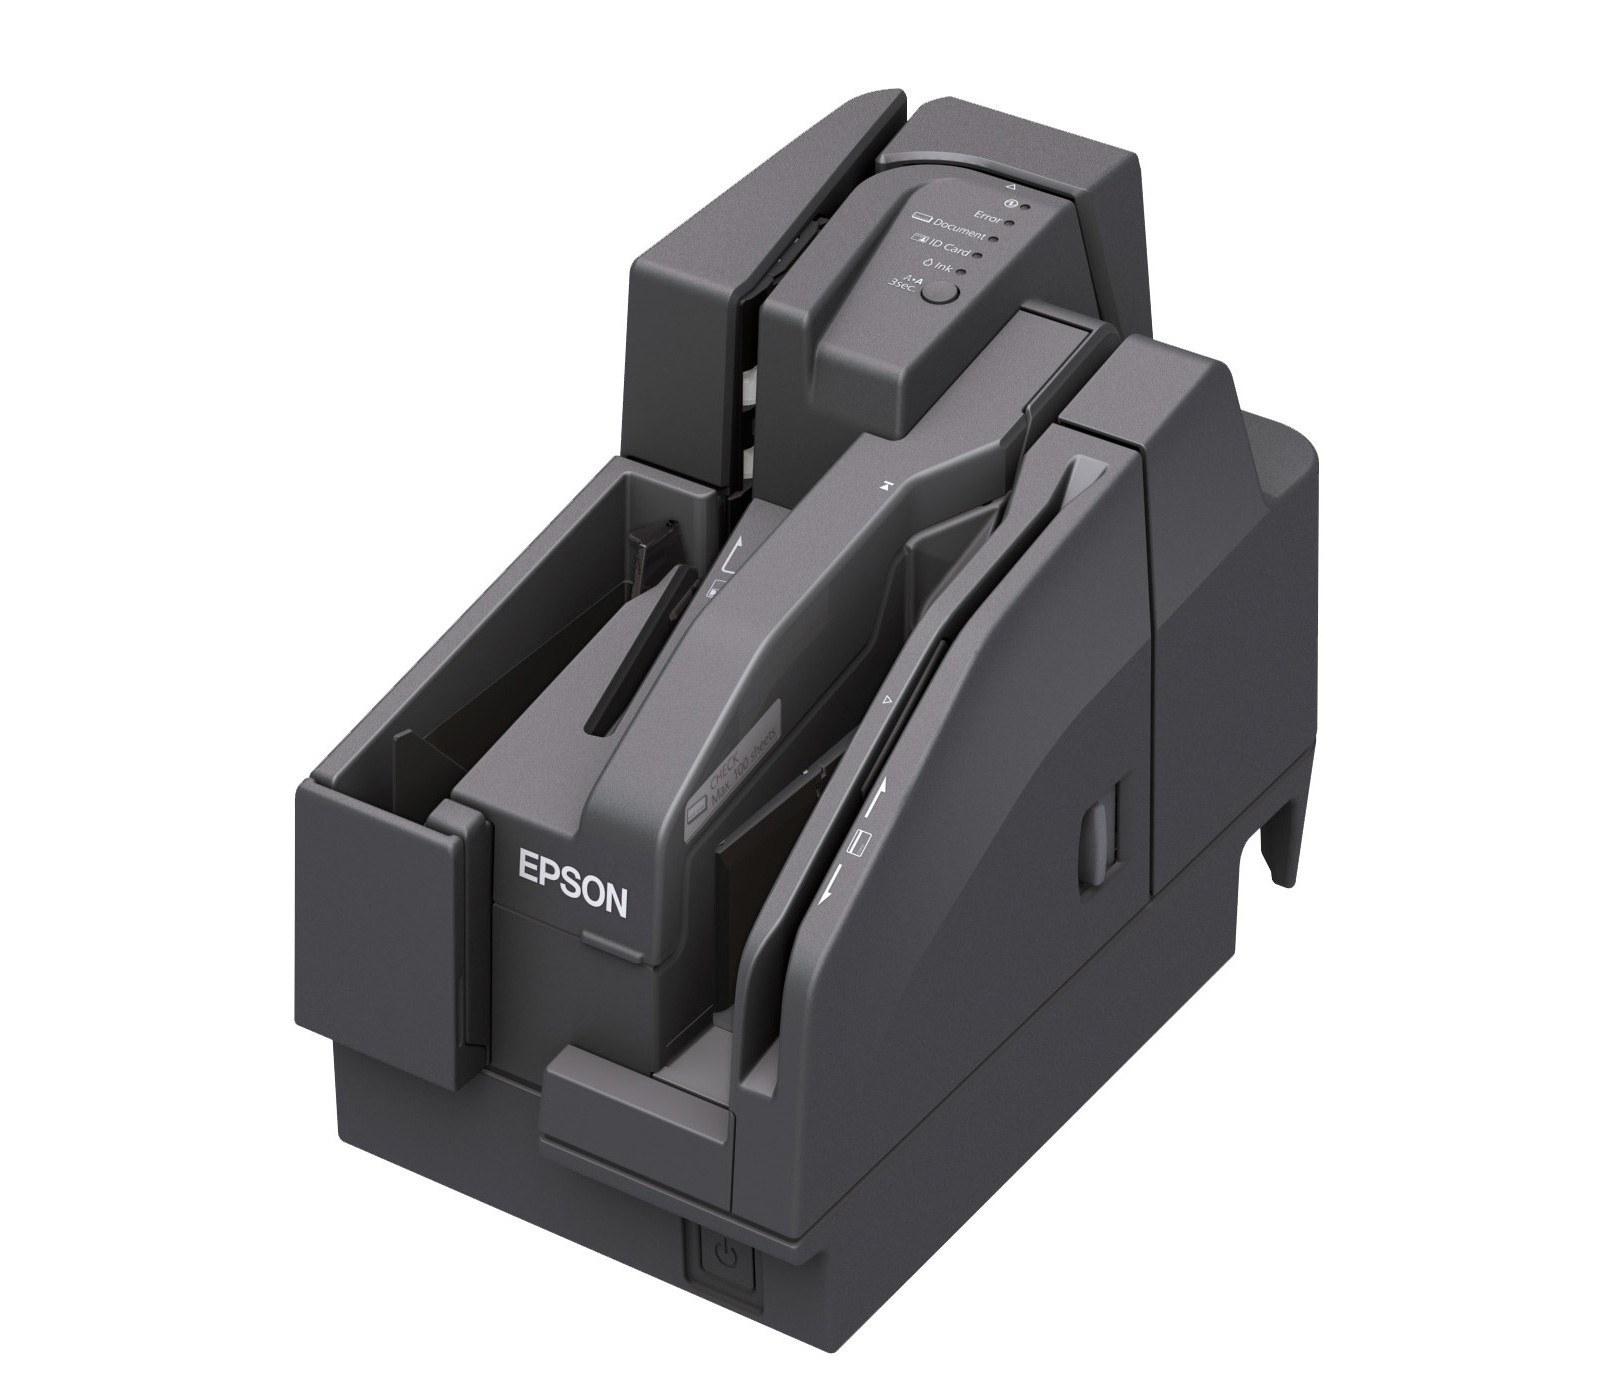 تصویر اسکنر چک اپسون مدل TM-S2000MJ Epson TM-S2000MJ Cheque scanner